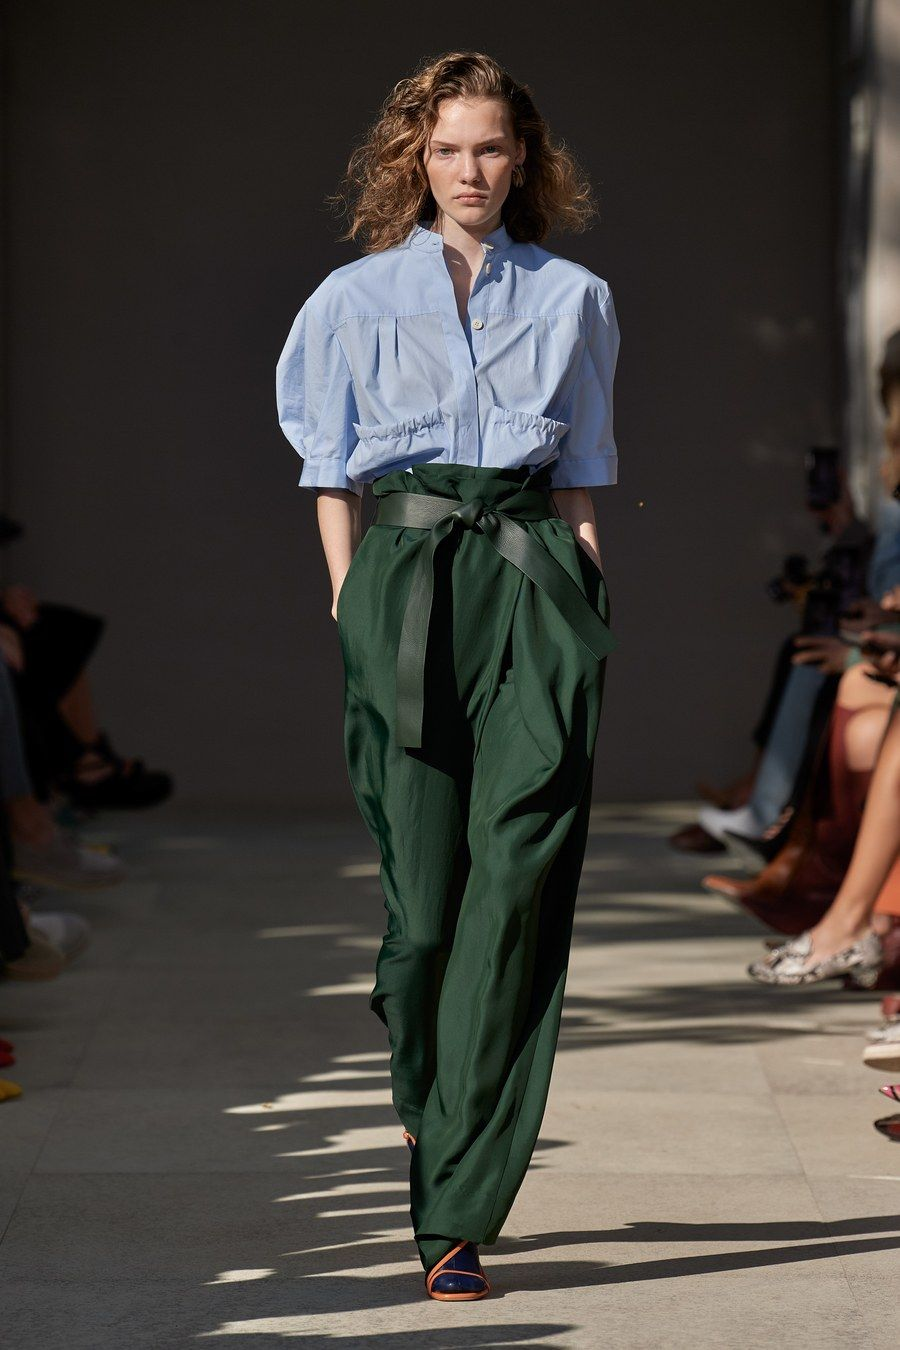 laringe engañar proteína  Salvatore Ferragamo Spring 2020 Ready-to-Wear Collection   Fashion, Runway  fashion, Fashion 2020